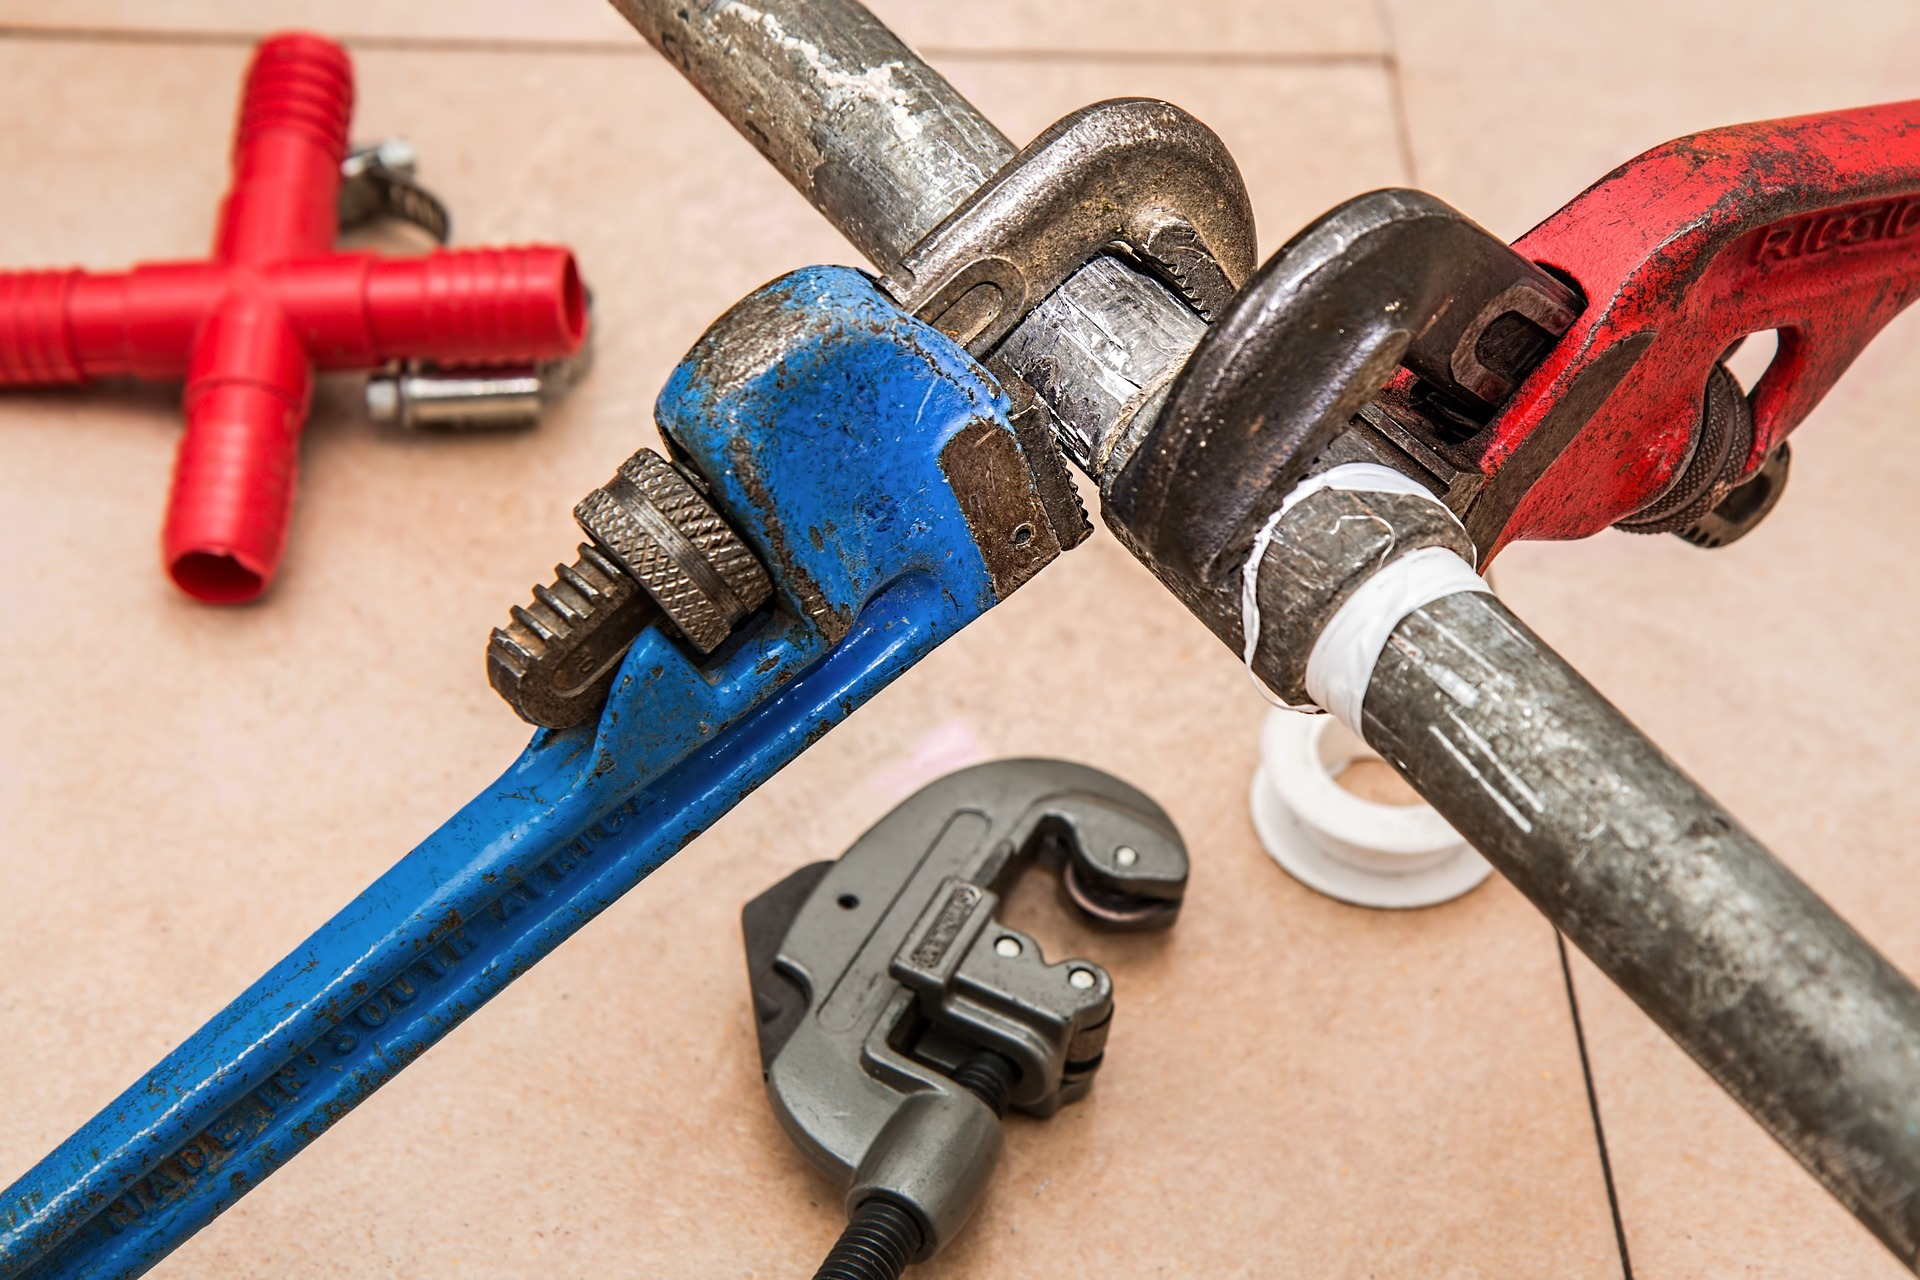 Emergency Plumbing Services : Plumbing services in el paso tx el paso emergency leak detection